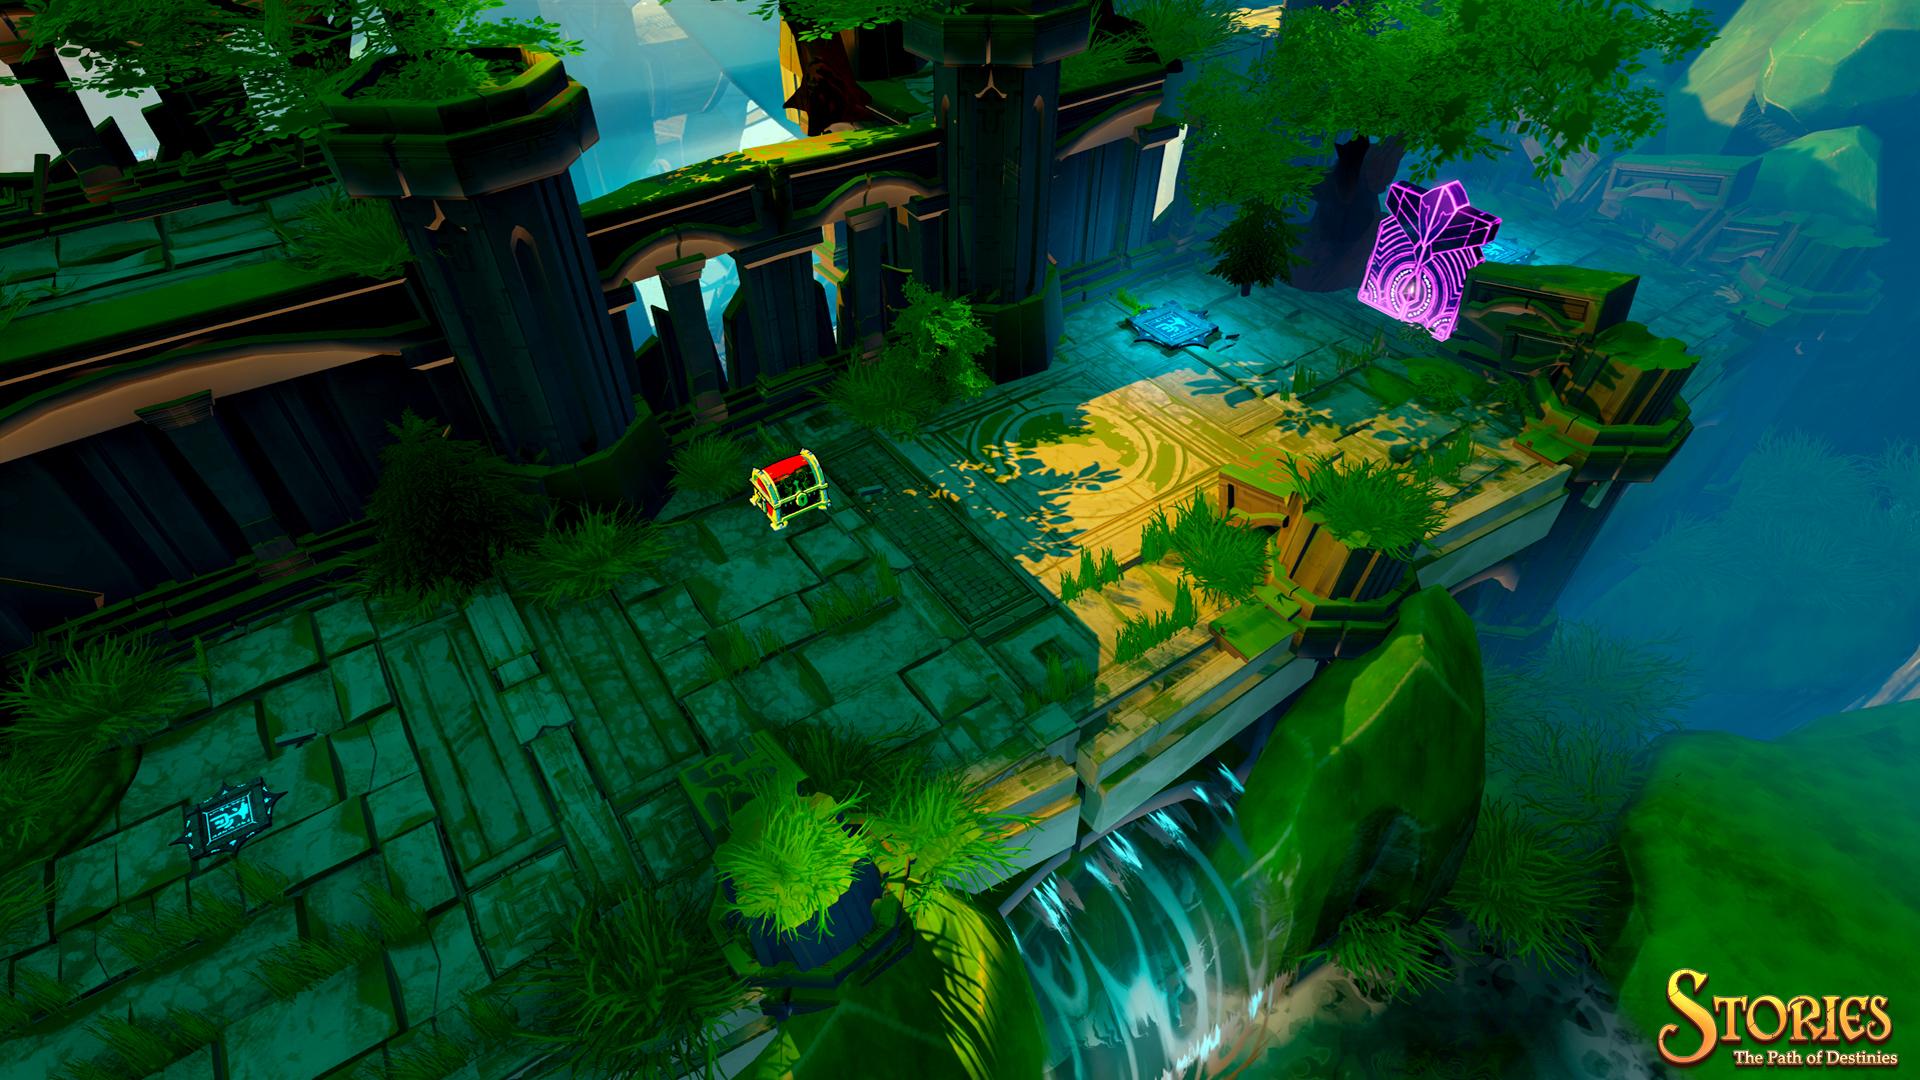 Stories: The Path of Destinies screenshot